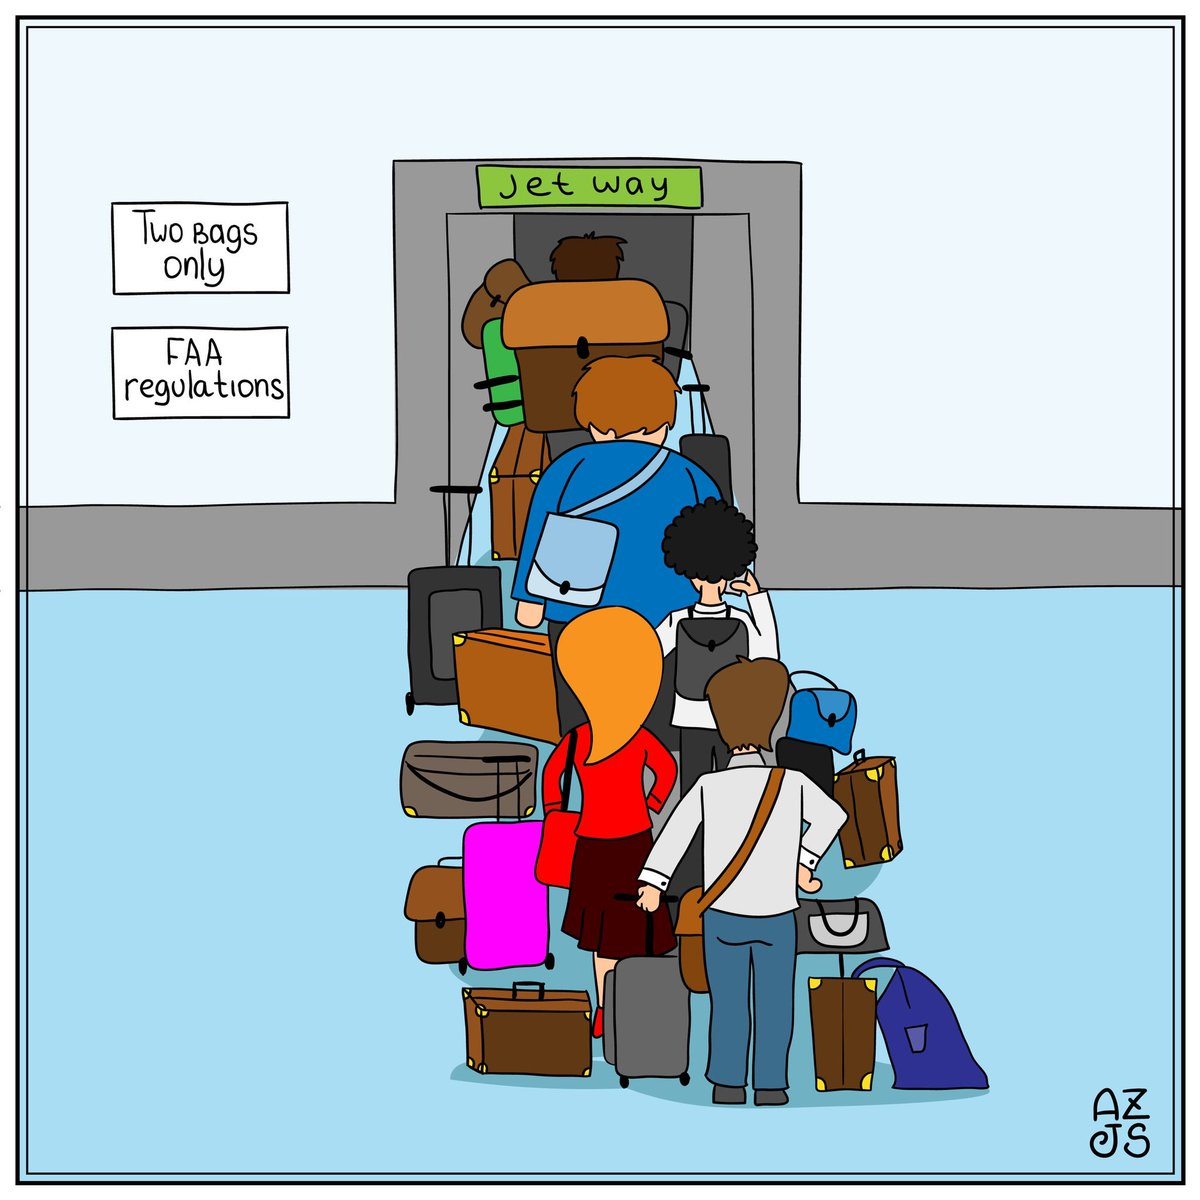 @JonPSanchez Traveler's Life (TM) #travel #travelcartoons #cartoons #airlinehumor #airlinelife #travellife #toomuchbaggage @alex.zhuro #traveler #traveltime #cartoonsbyalexzhuroandjonsanchez #comicstrip #comics #comicstrips #cartoons